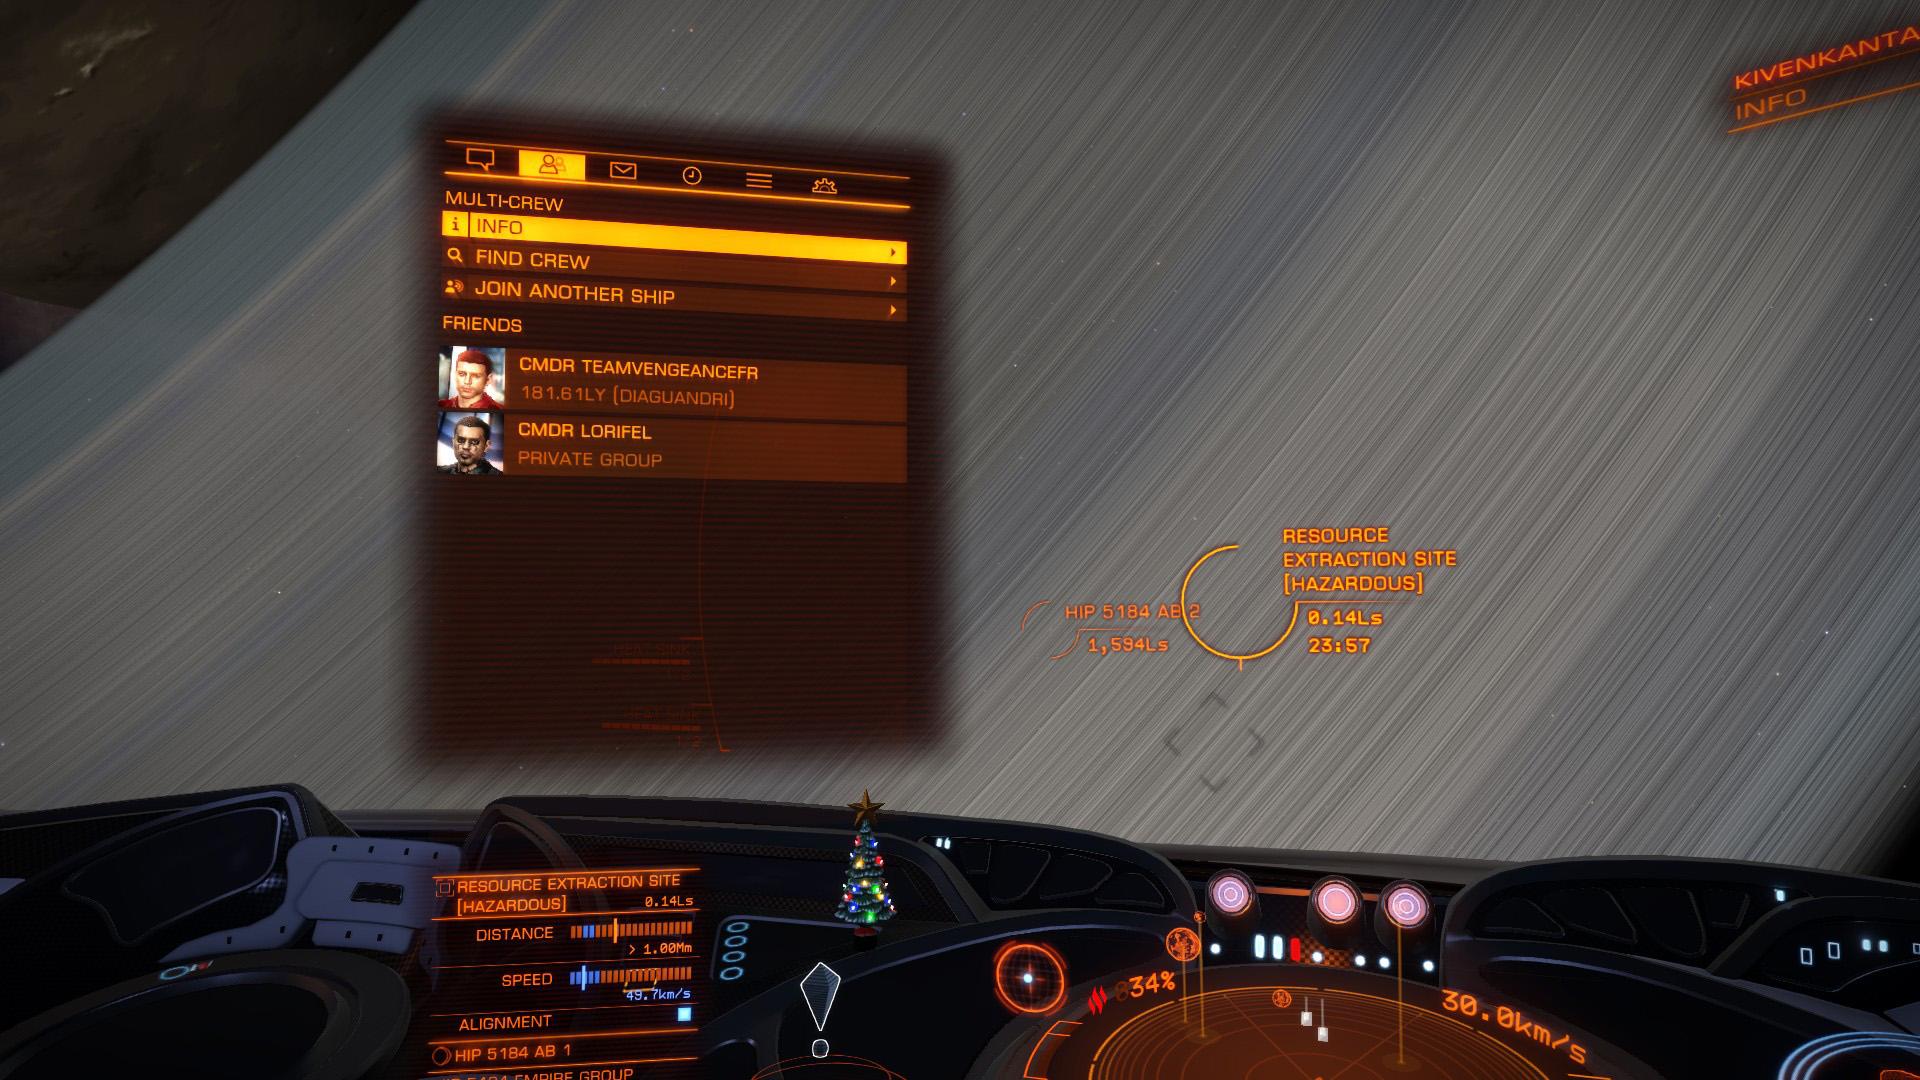 Elite: Dangerous beginner's guide: a screenshot showing the multicrew interface